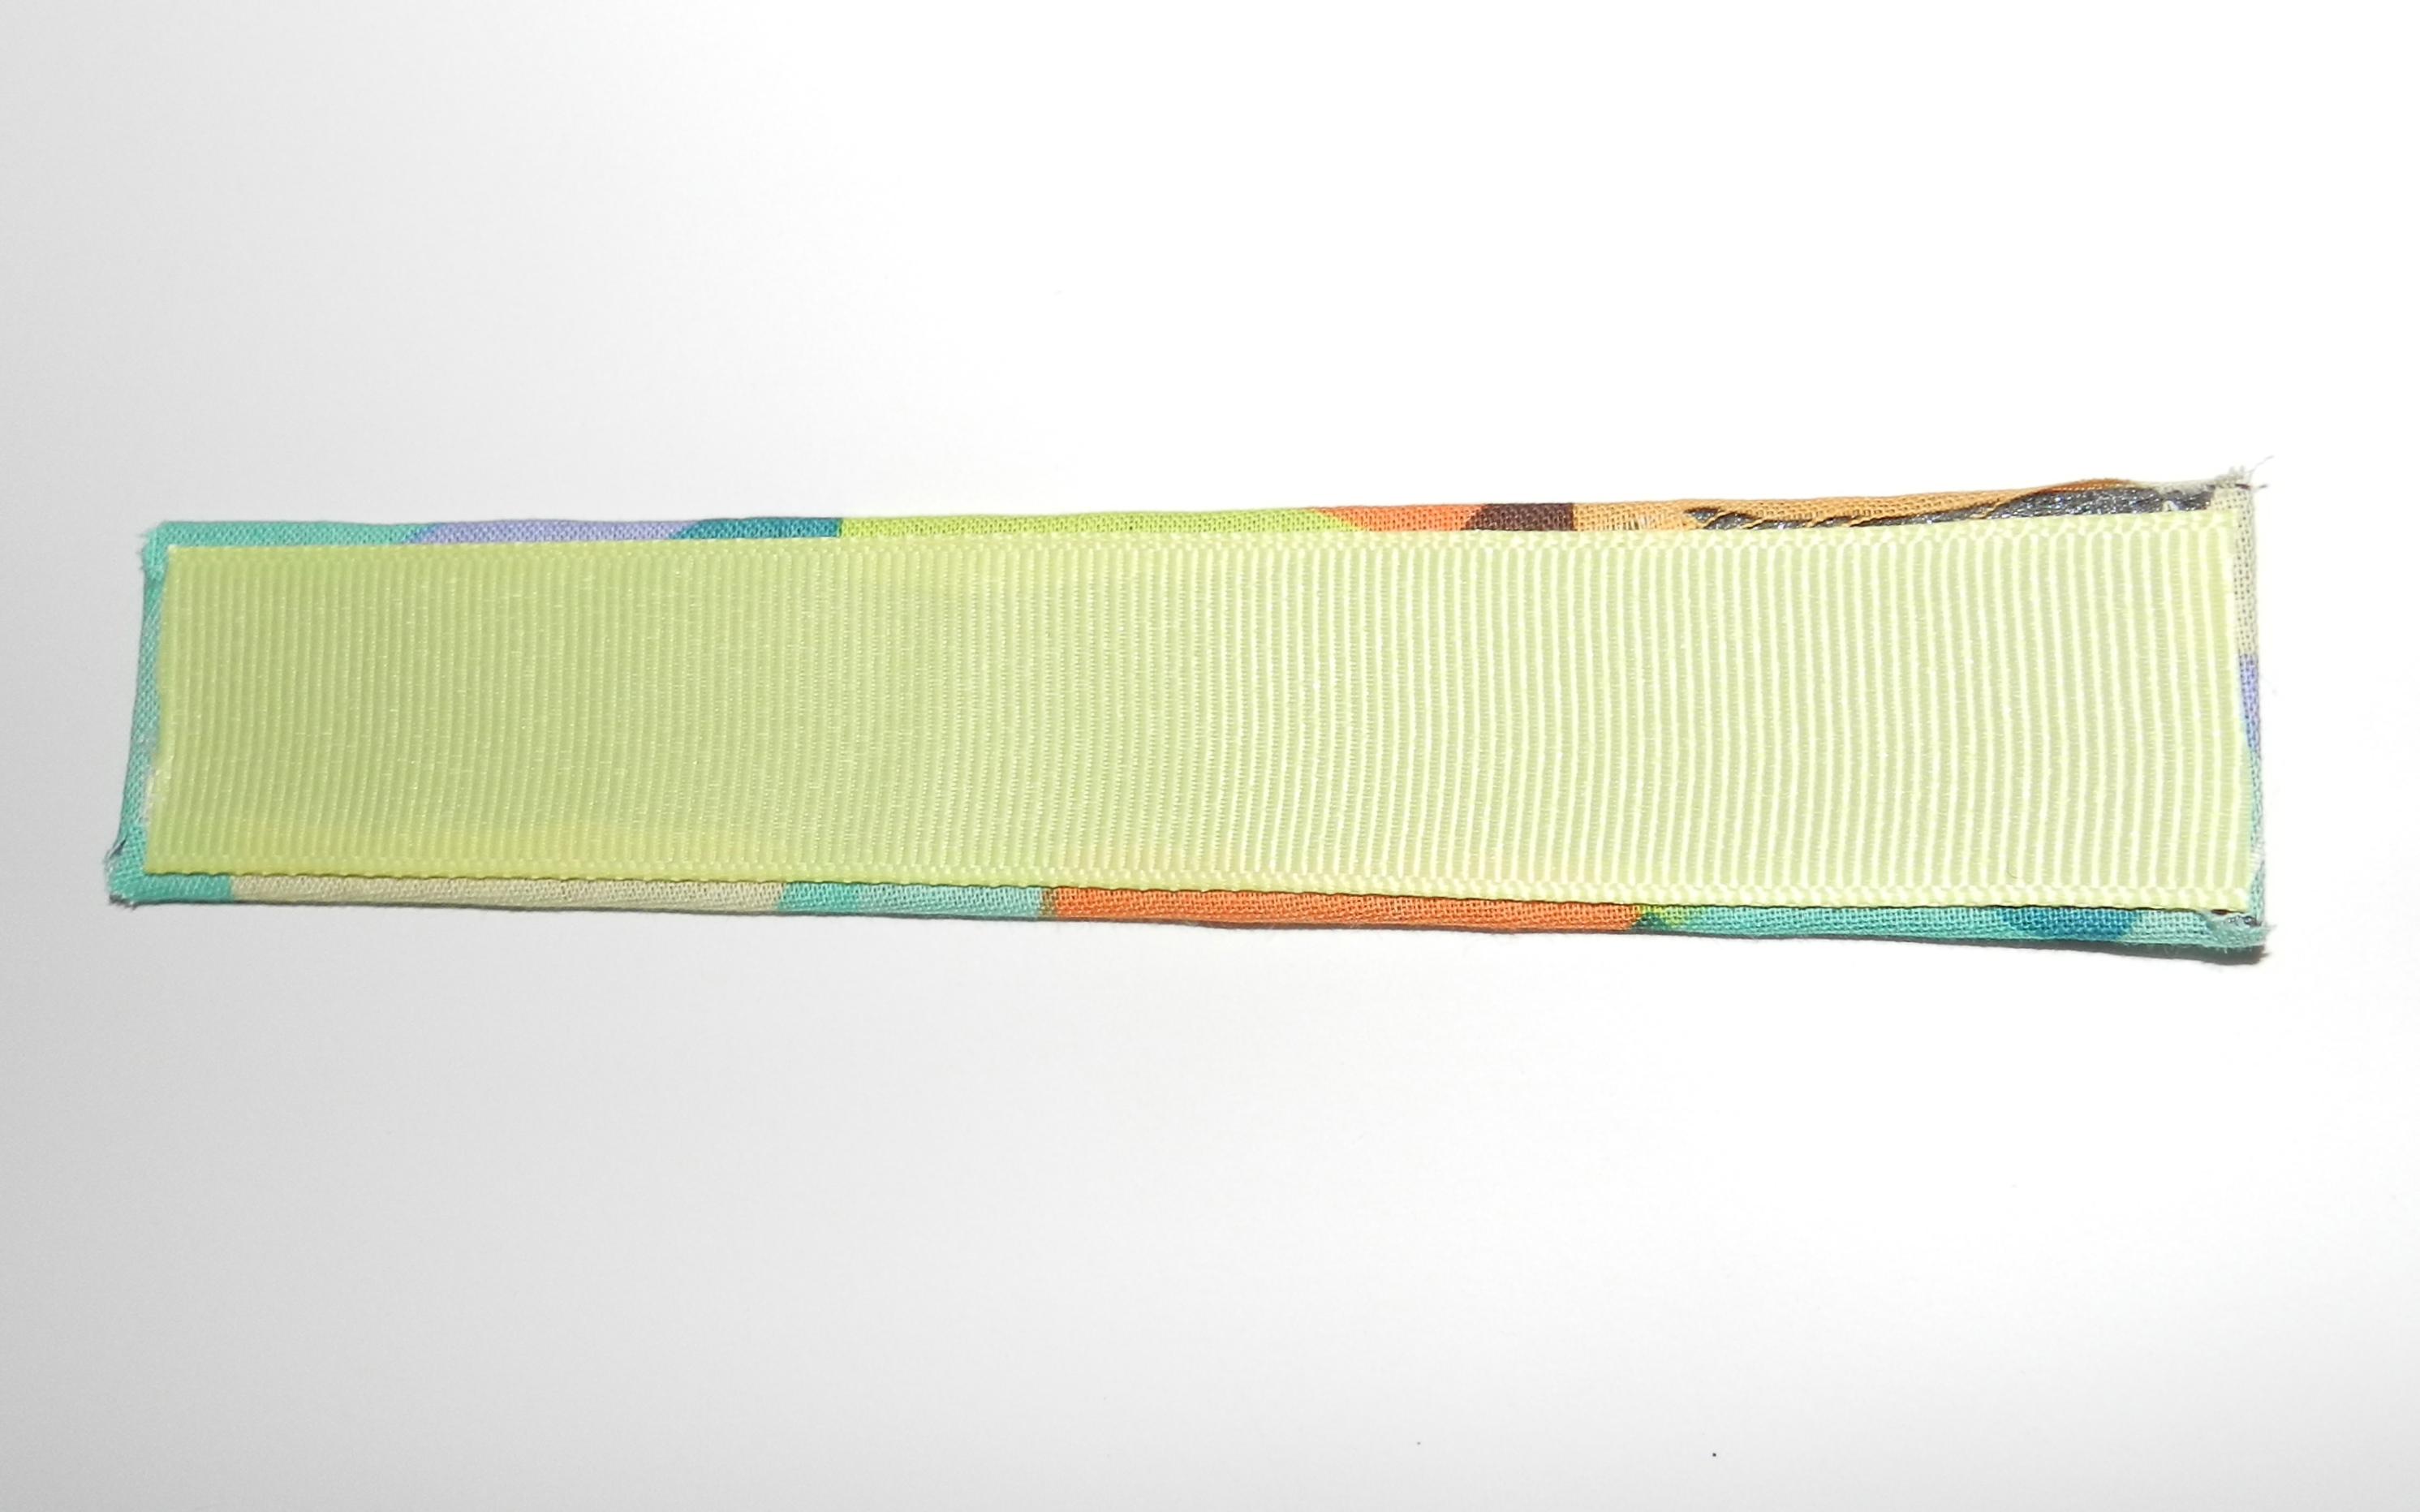 Fabric_Cuff_Bracelet_3